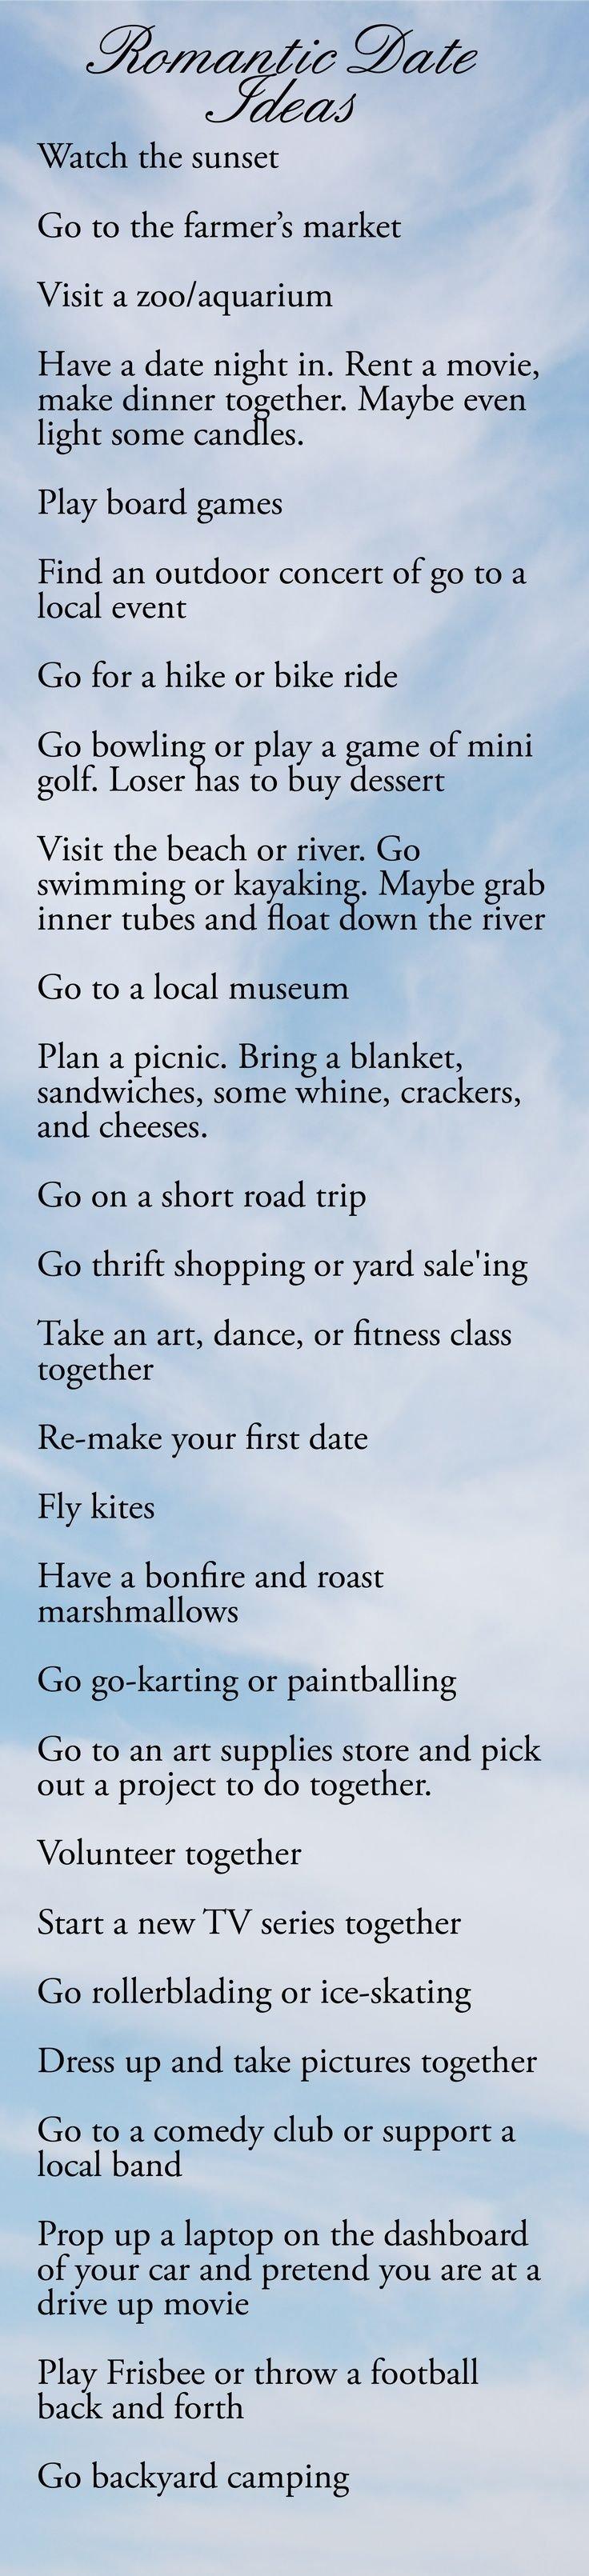 10 Gorgeous Creative Date Ideas For Couples 152 best date ideas images on pinterest my love romantic ideas 4 2020